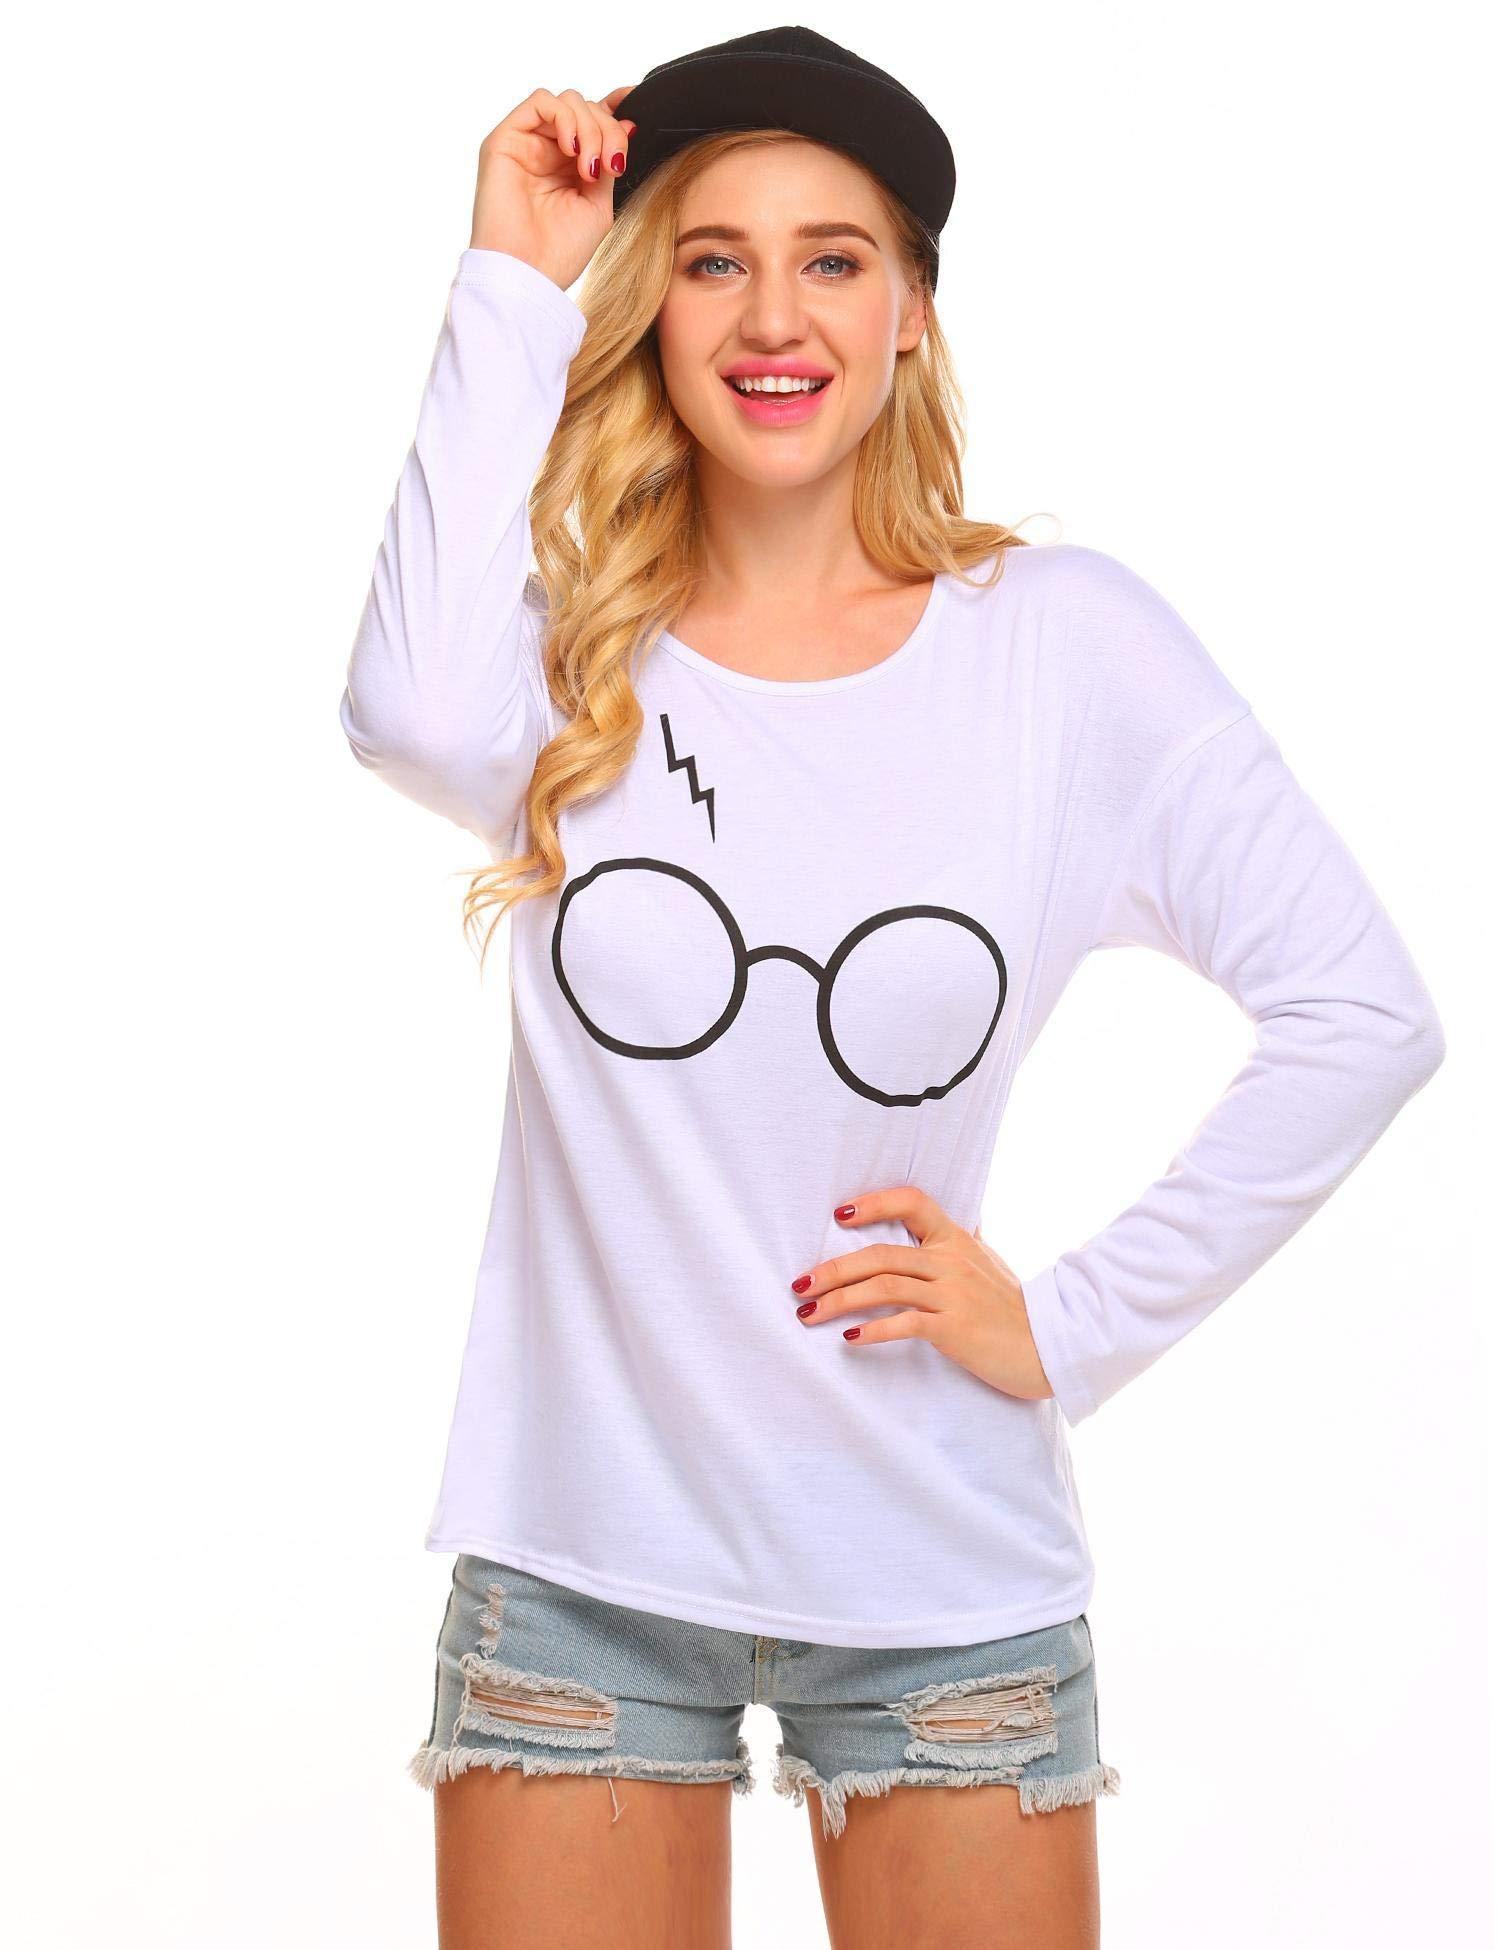 Diaper Women's Autumnn Fashion Long Sleeve Pullover Harry Potter Glasses Prints Sweatshirt Sweater Tops,White,Medium